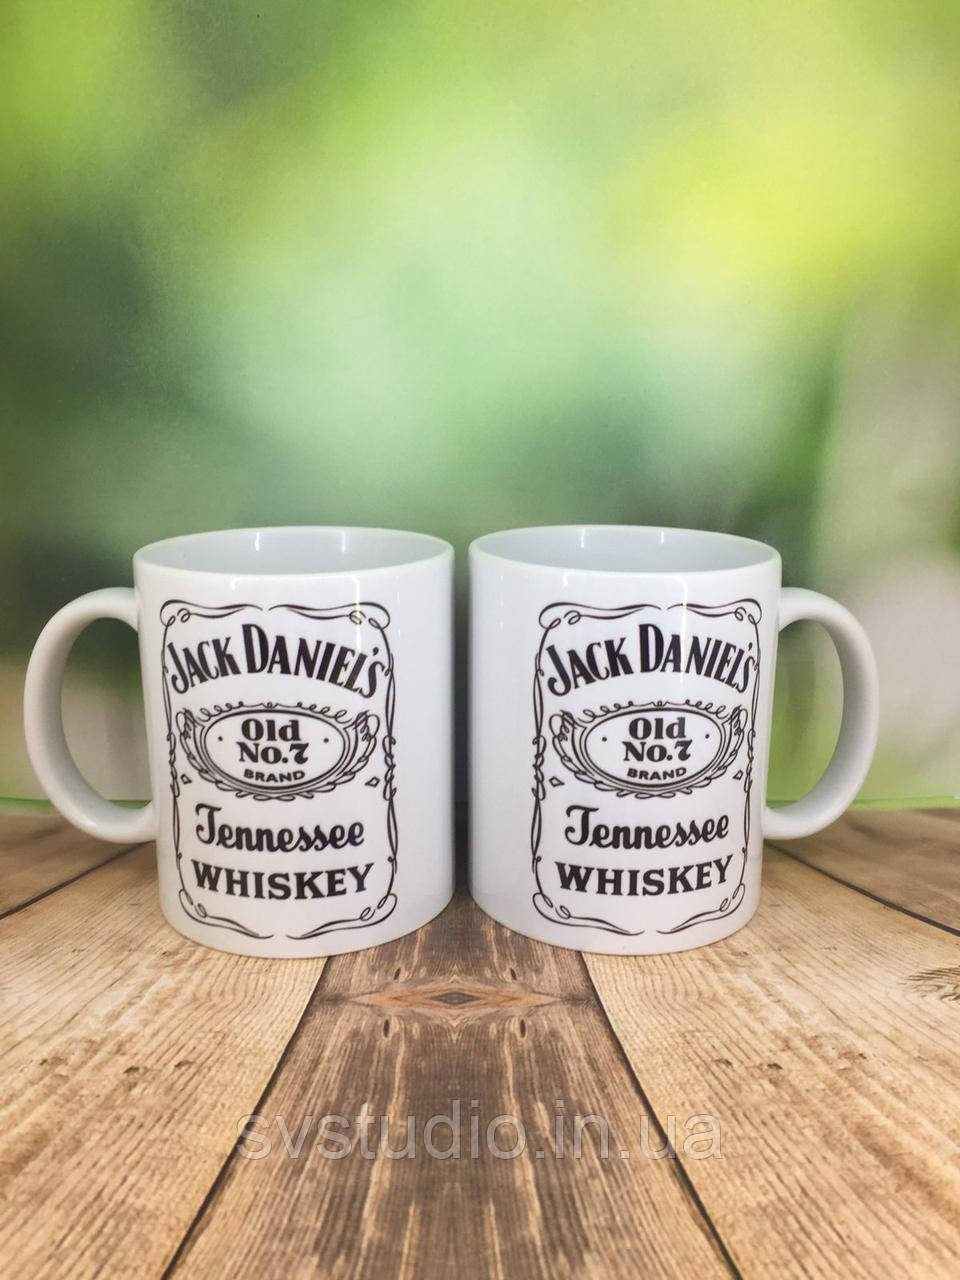 Друк на чашках,Чашка Jack daniel's